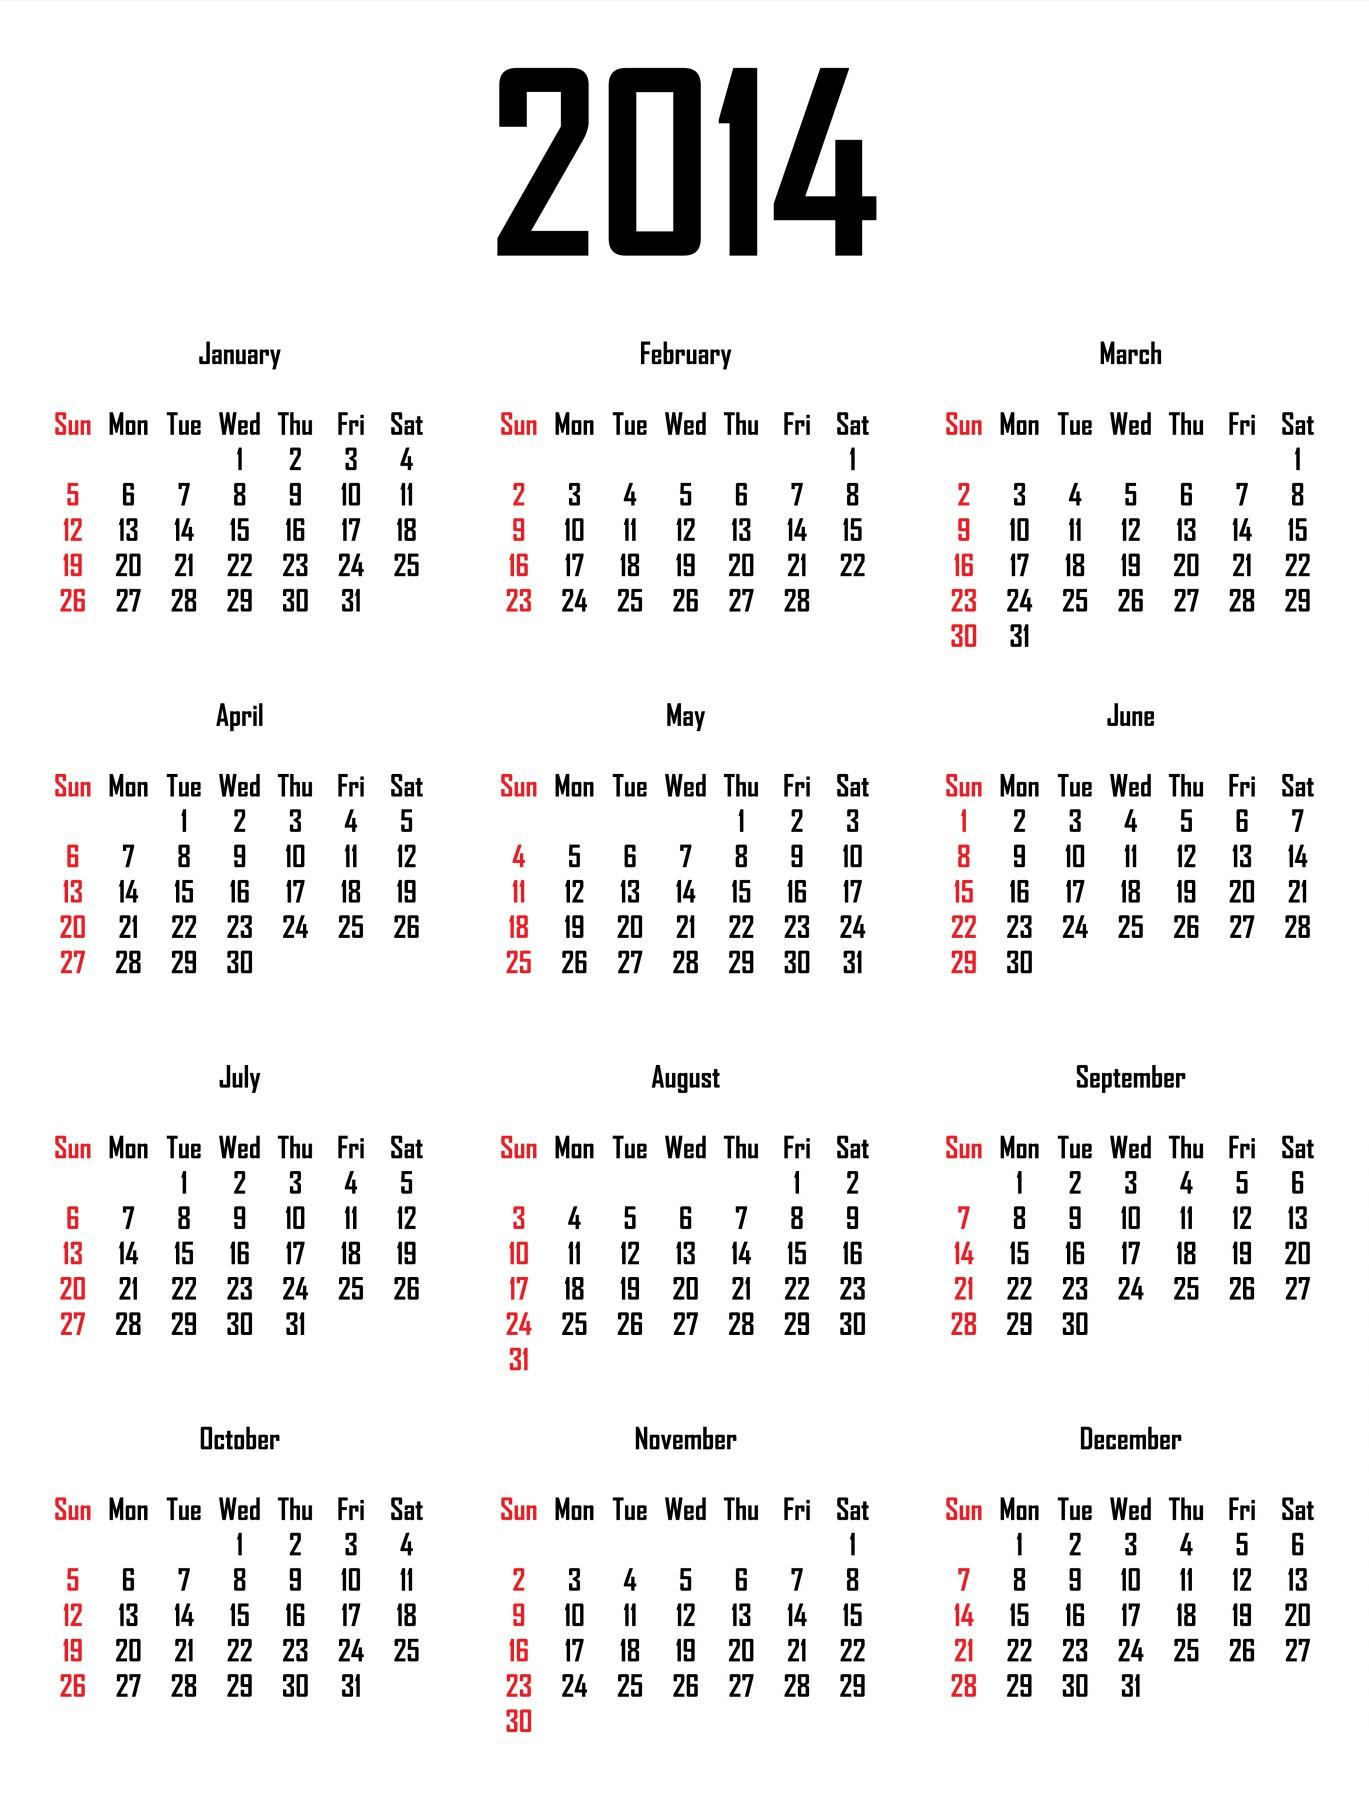 Wonderful 1 Year Experience Resume Format For Java Developer Thin 100 Day Glasses Template Regular 1096 Form Template 1099 Int Template Old 13b Porting Templates Bright20 Degree Angle Template Eleven] High Resolution 2014 Calendar \u2013 FREE Calendars \u2022 Elsoar